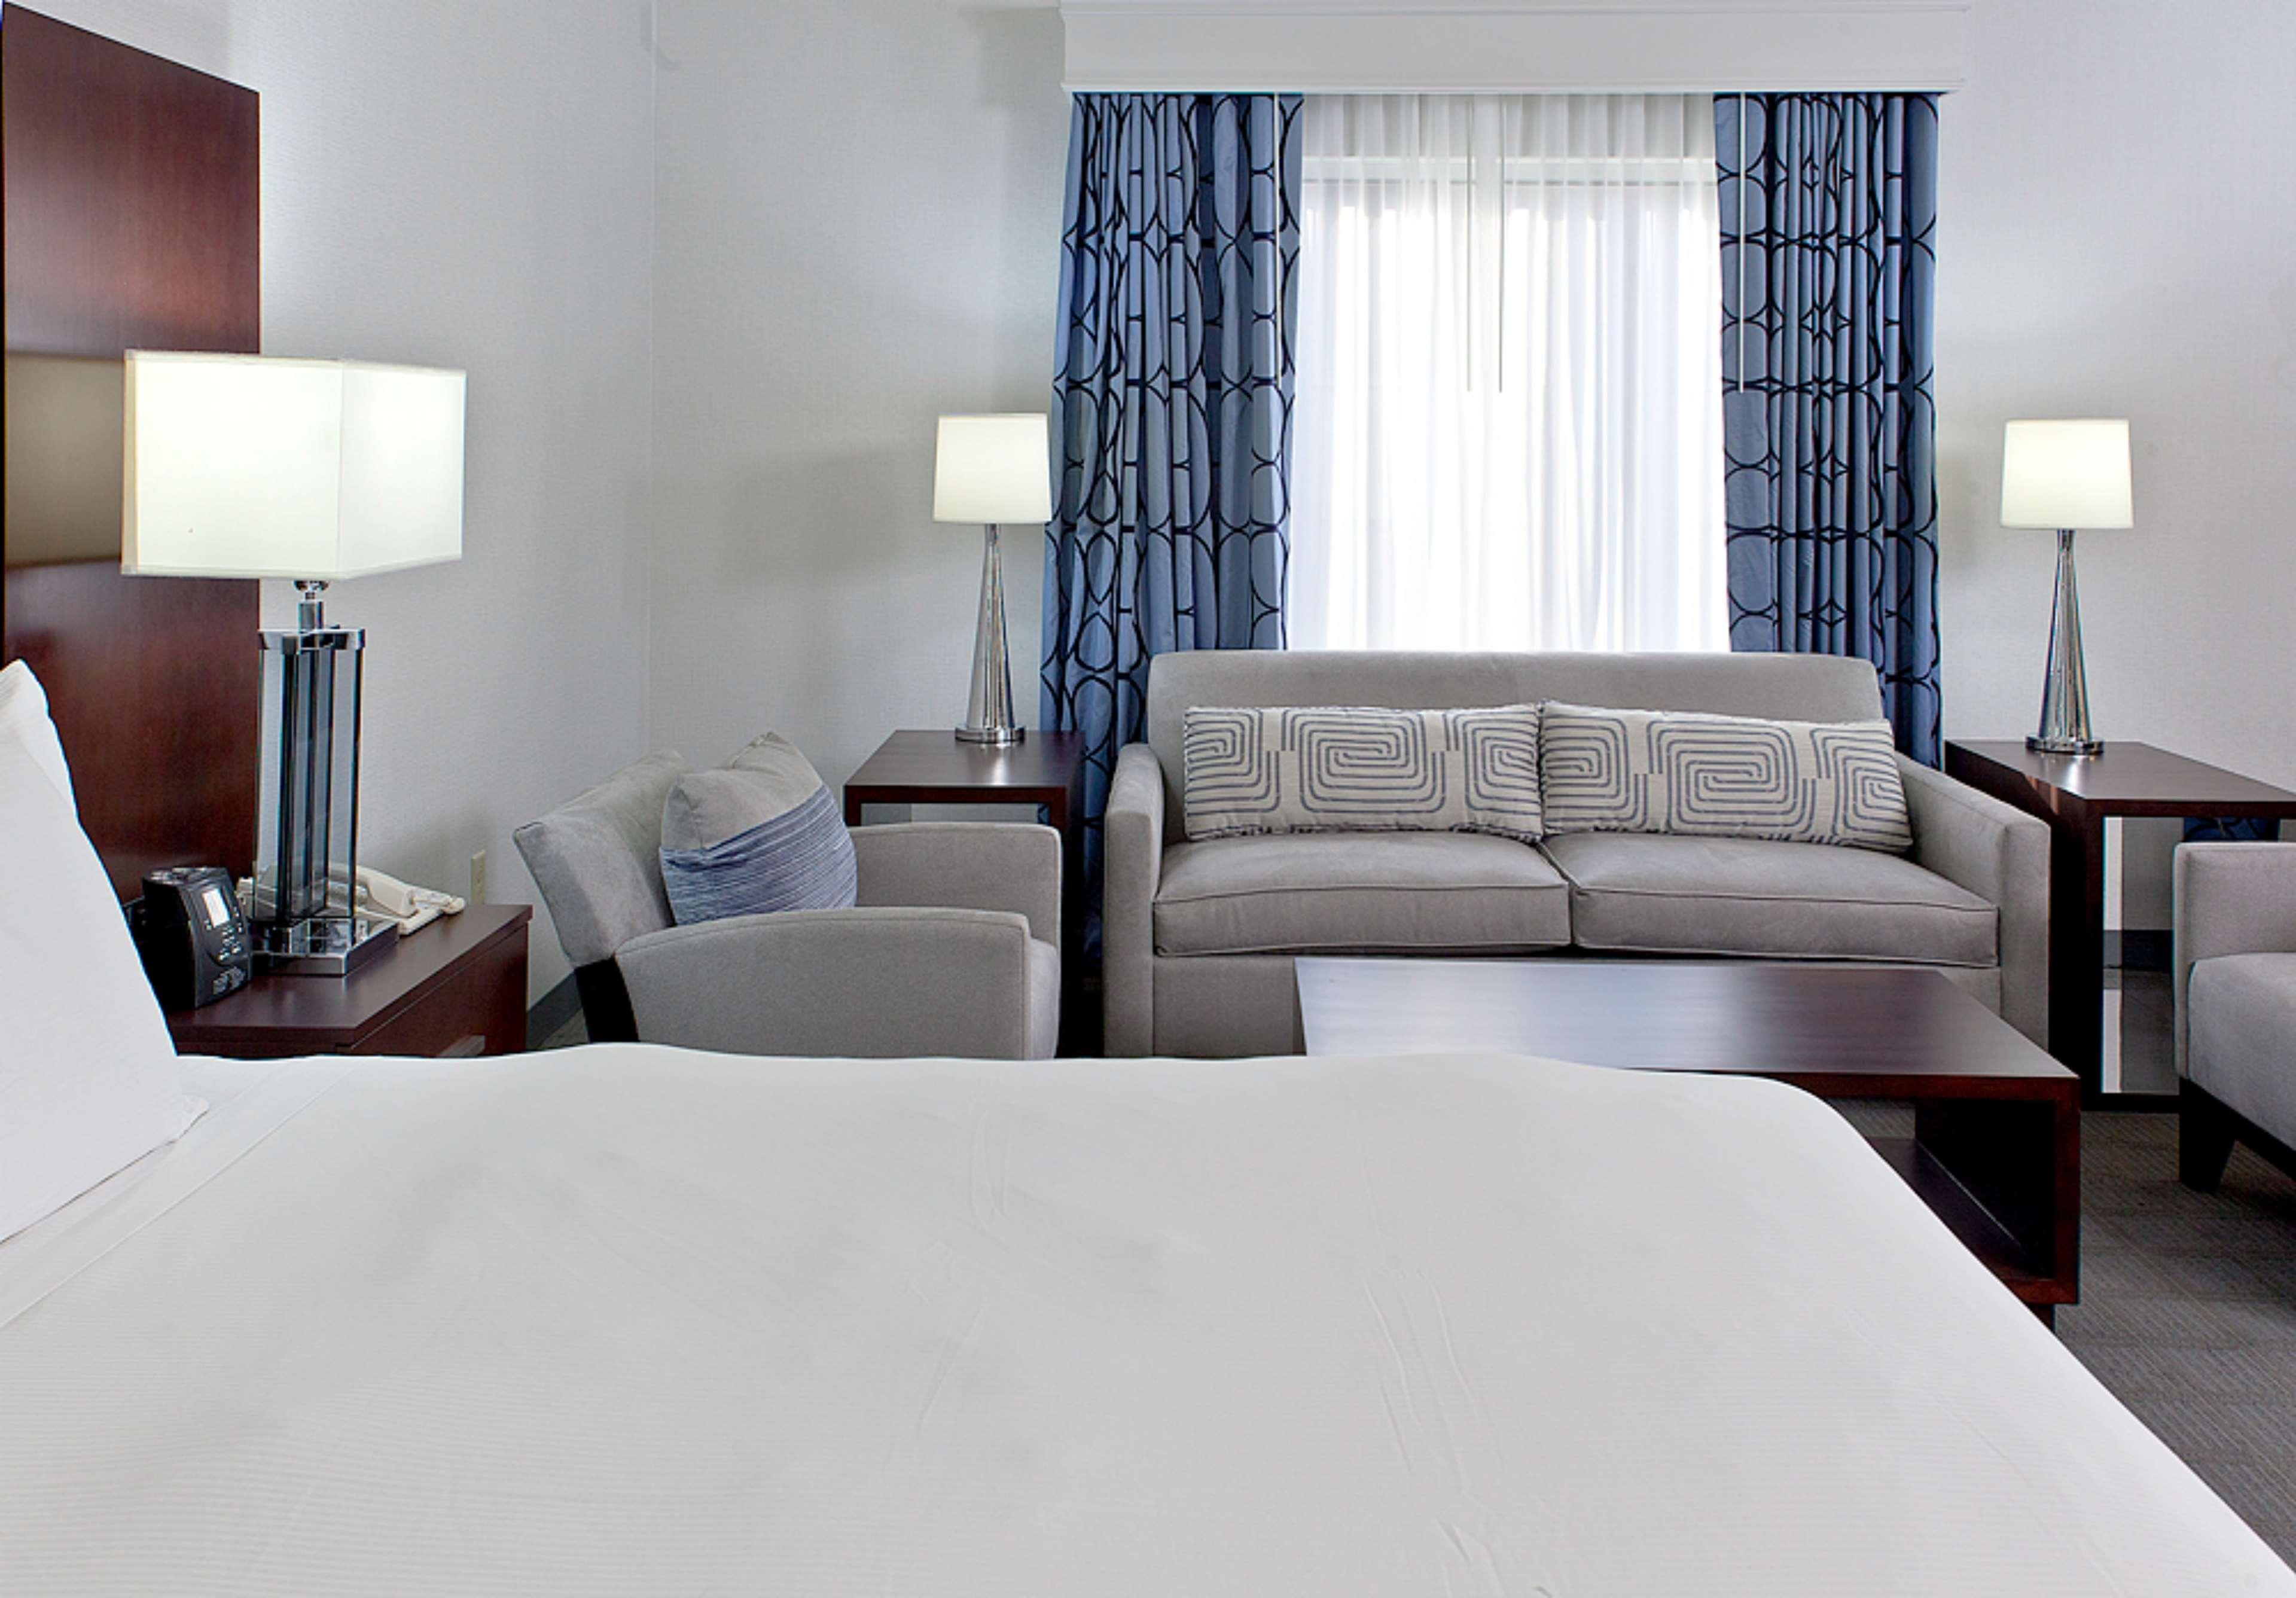 Hilton Scranton & Conference Center image 19